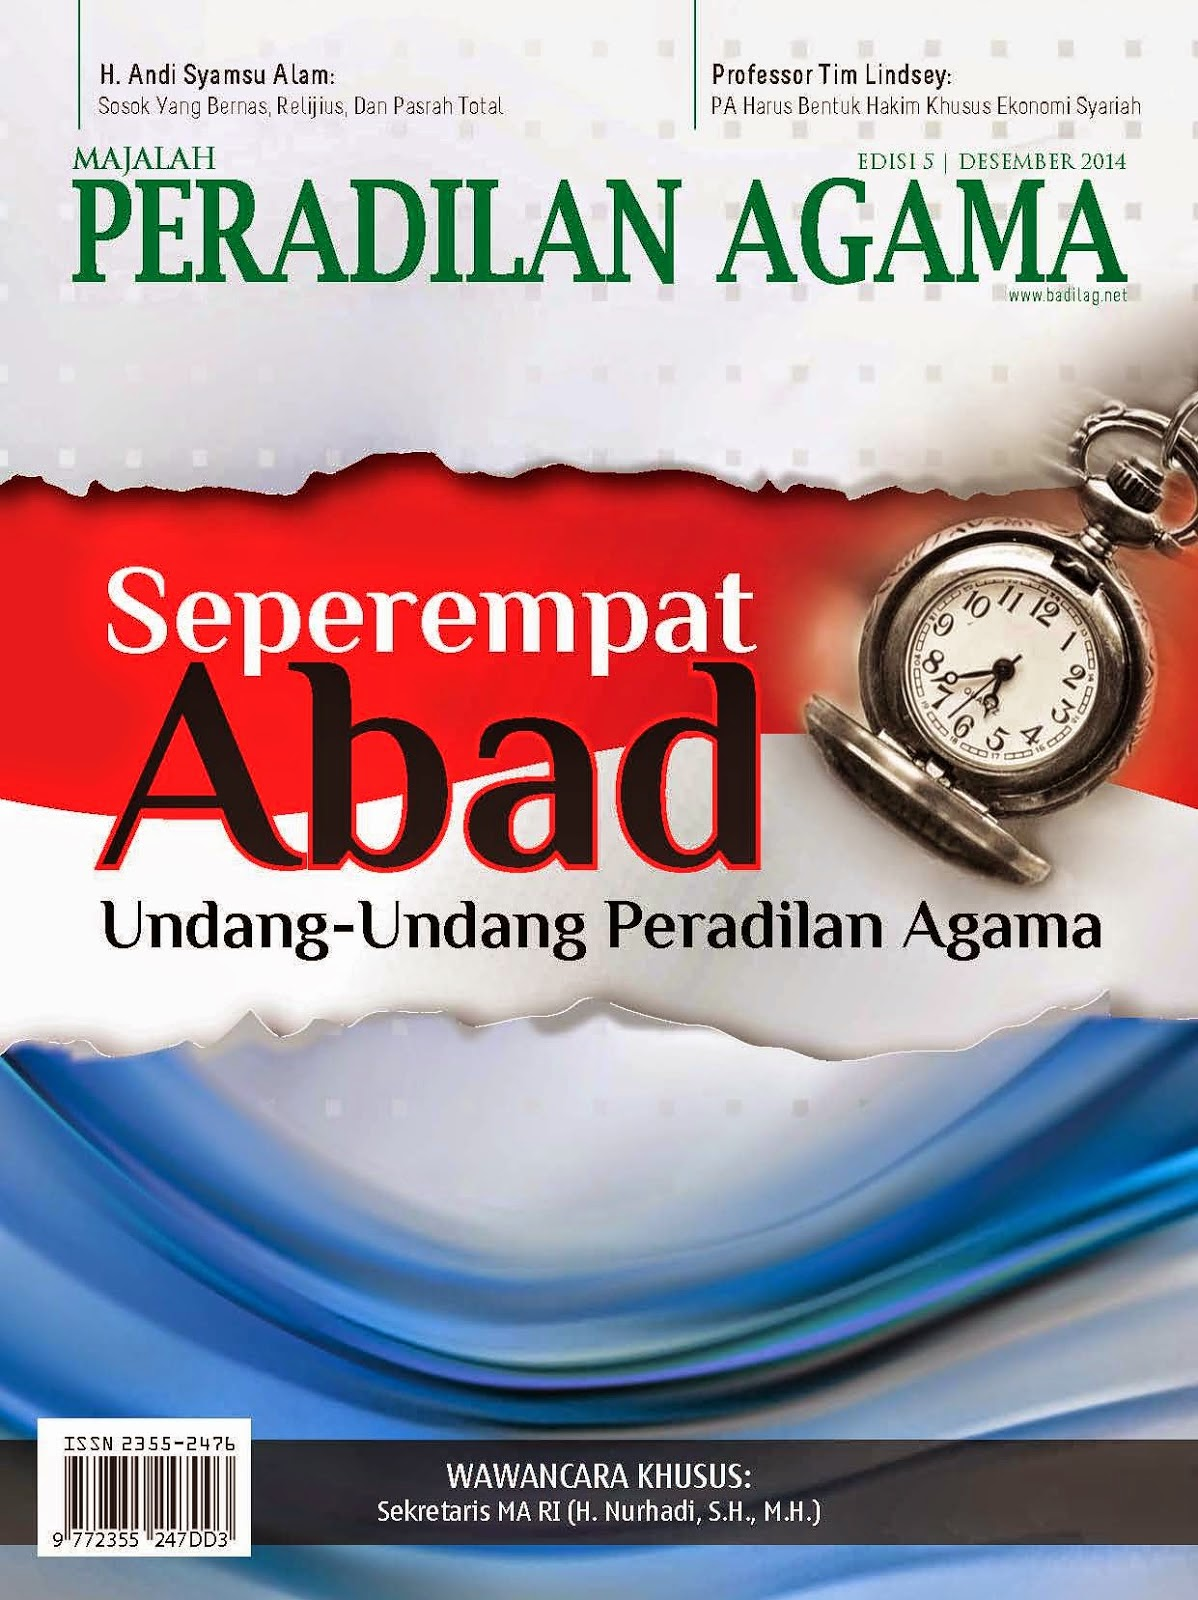 Majalah Peradilan Agama Edisi Kelima